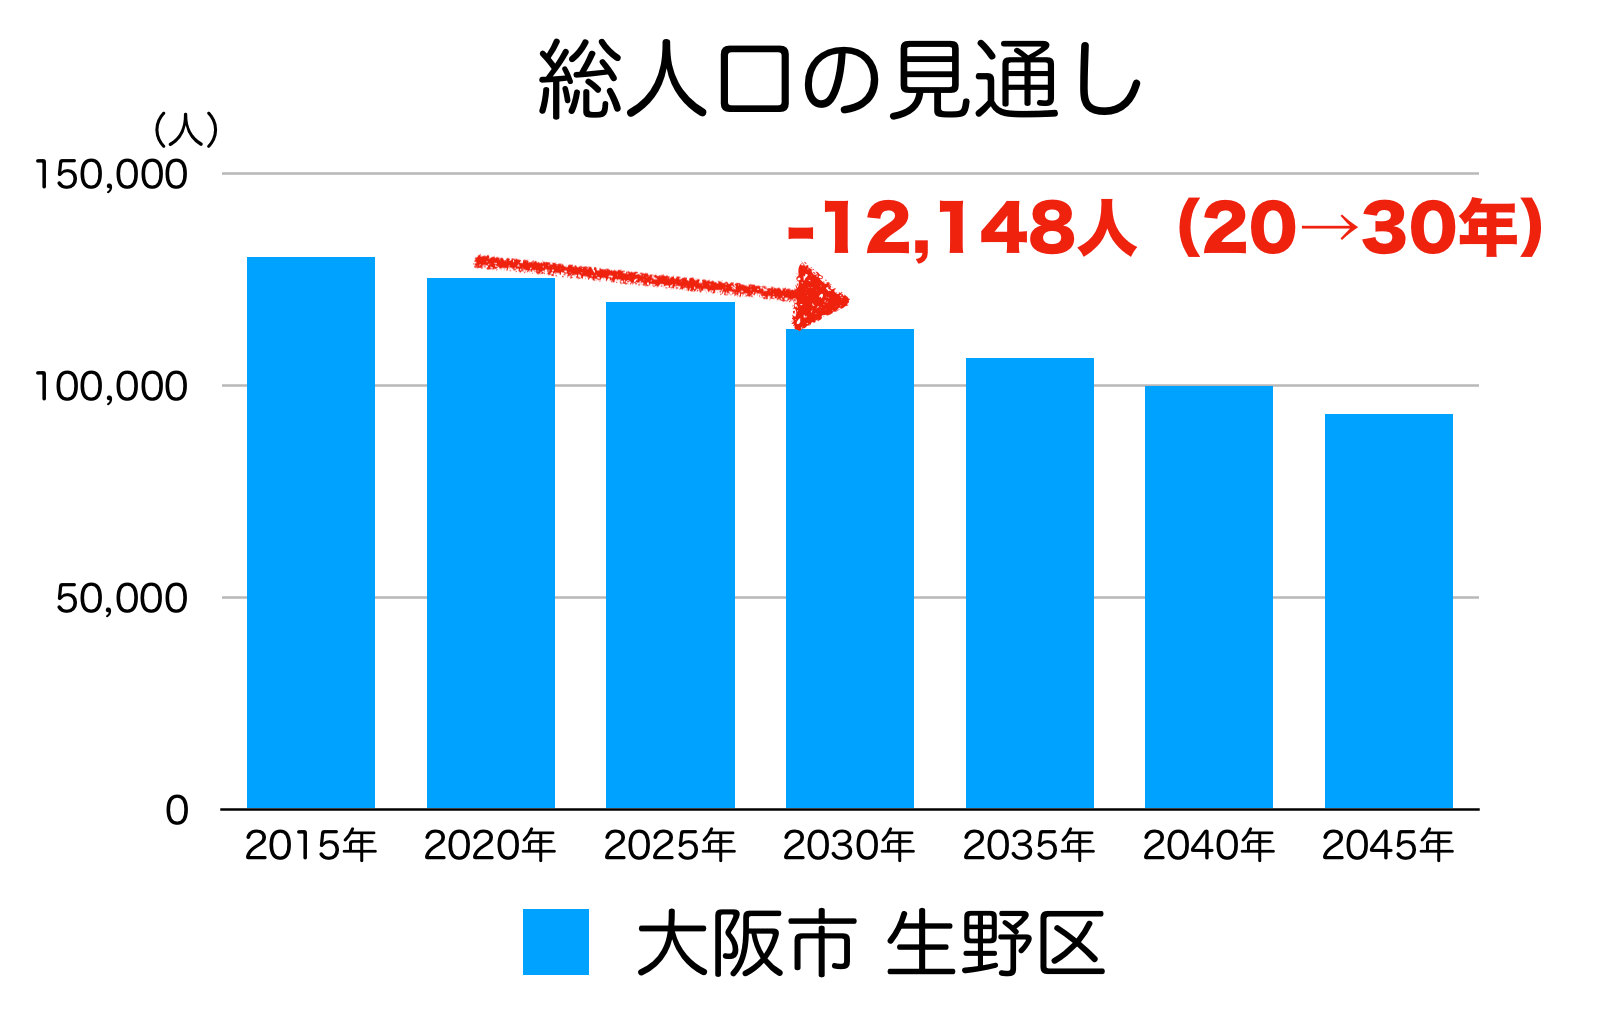 大阪市生野区の人口予測